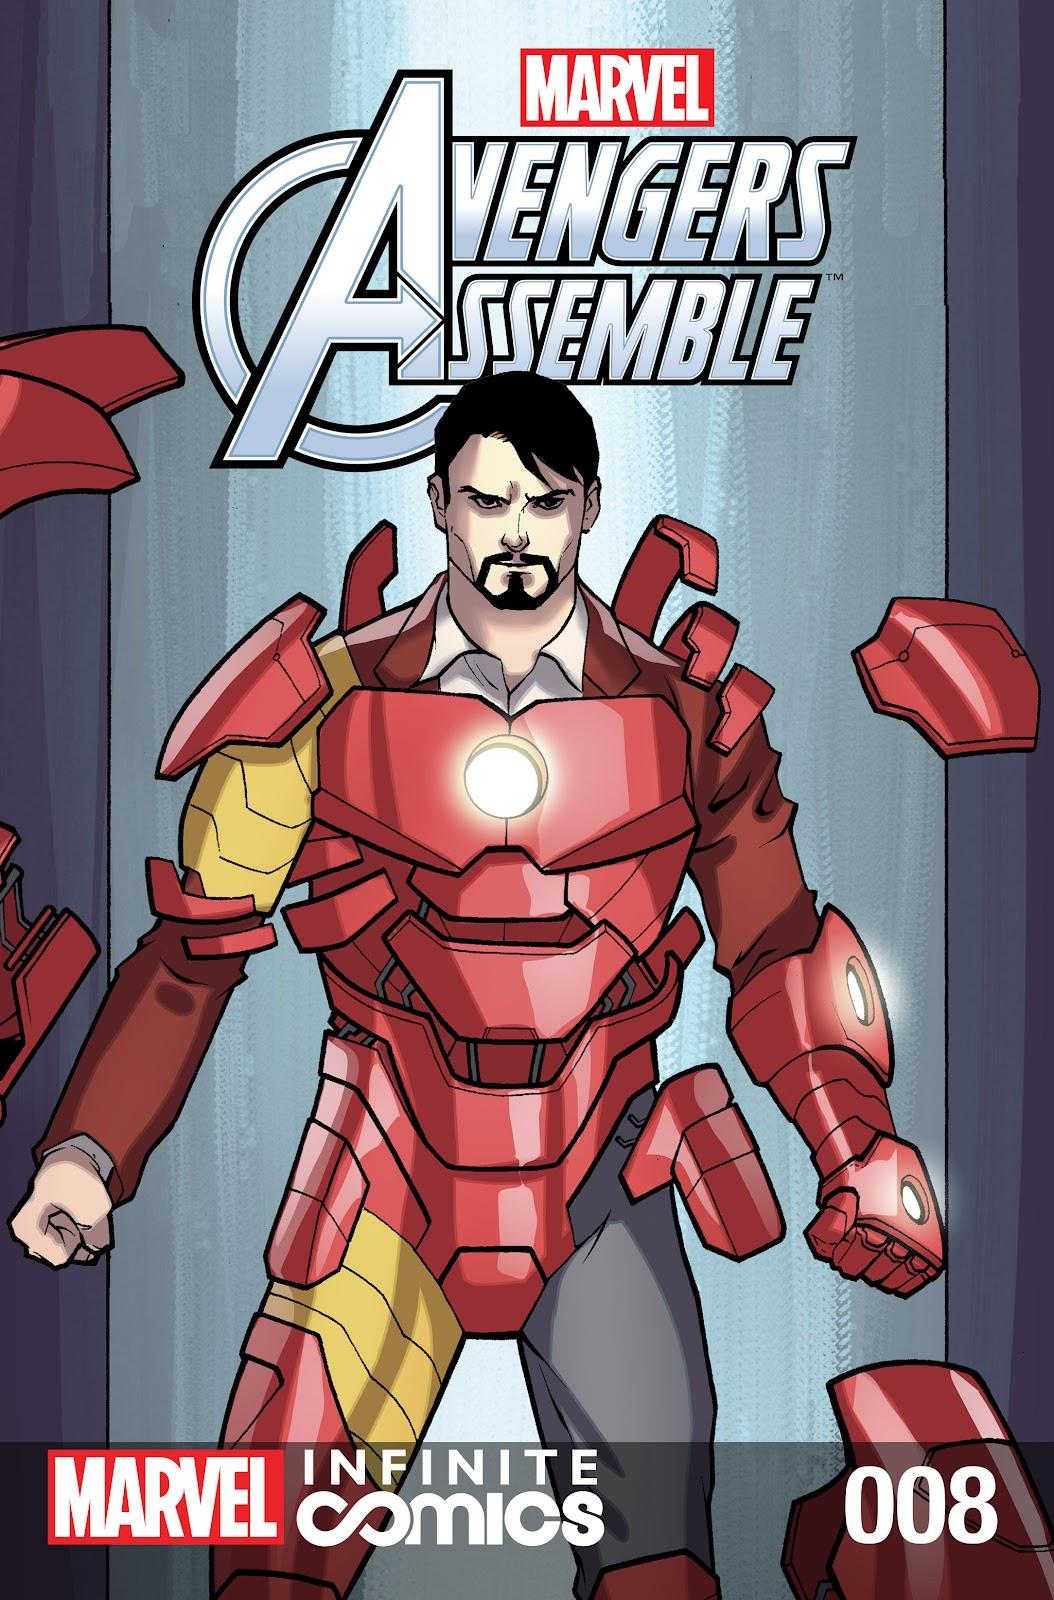 Marvel Universe Avengers Infinite Comic 8 Page 1